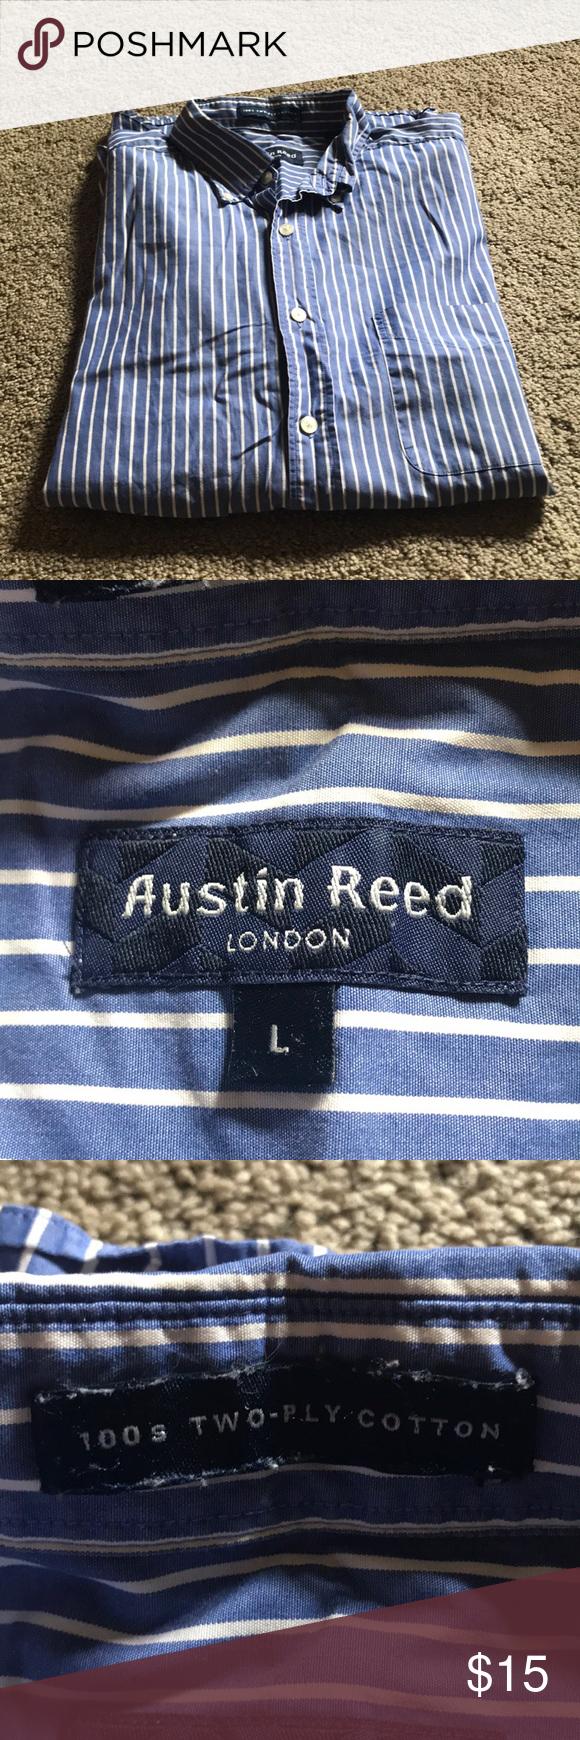 Austin Reed London Striped Long Sleeve Striped Long Sleeve Button Down Shirt Mens Casual Button Down Shirts